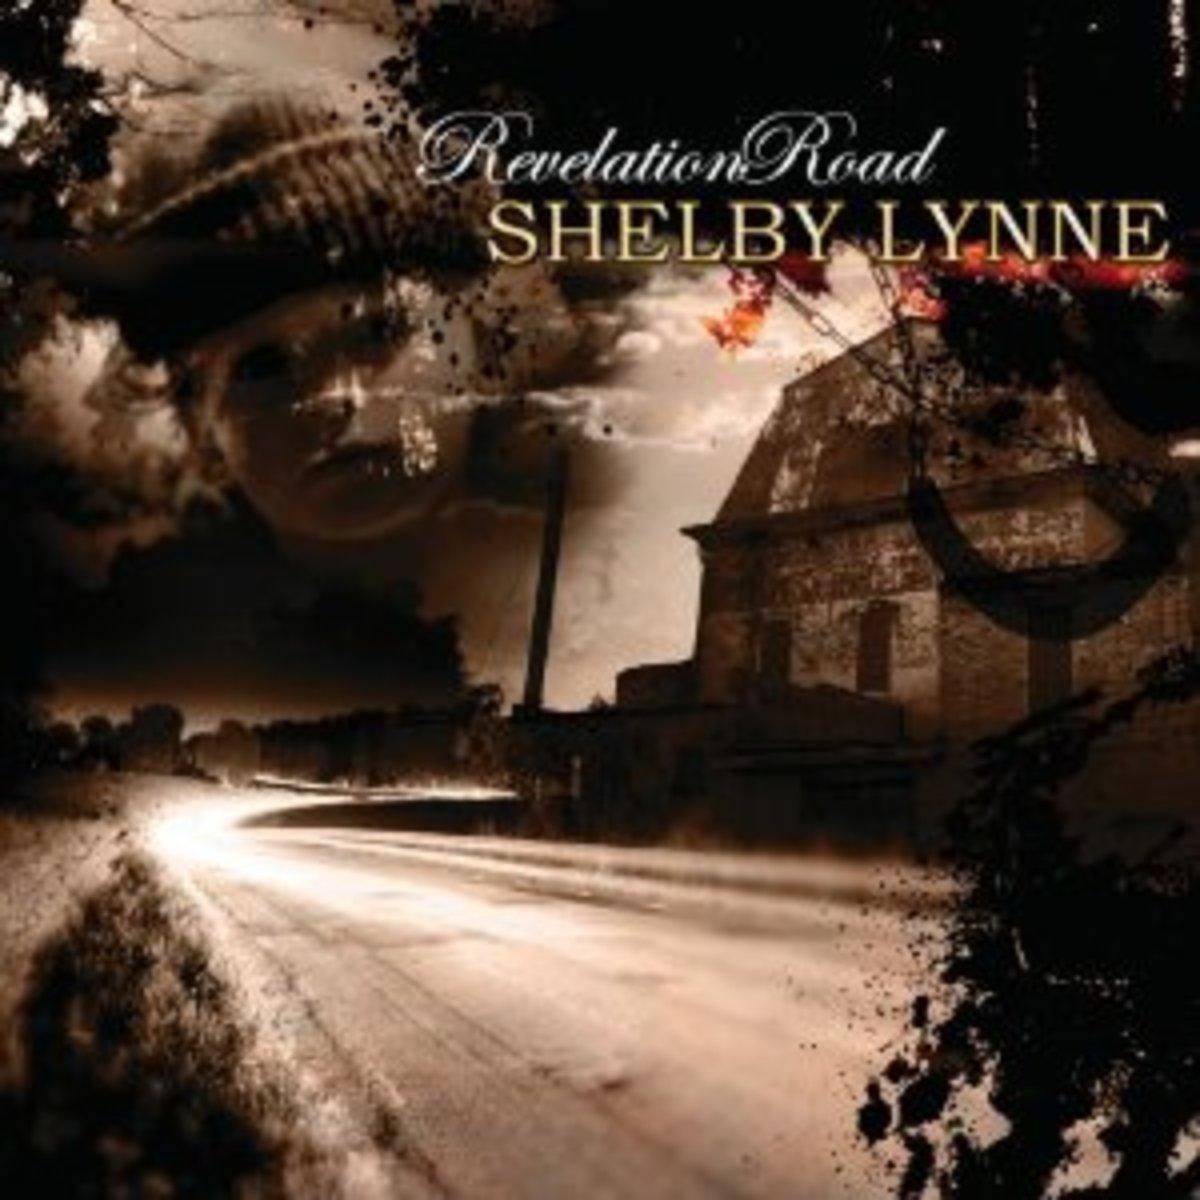 Shelby Lynne Revelation Road